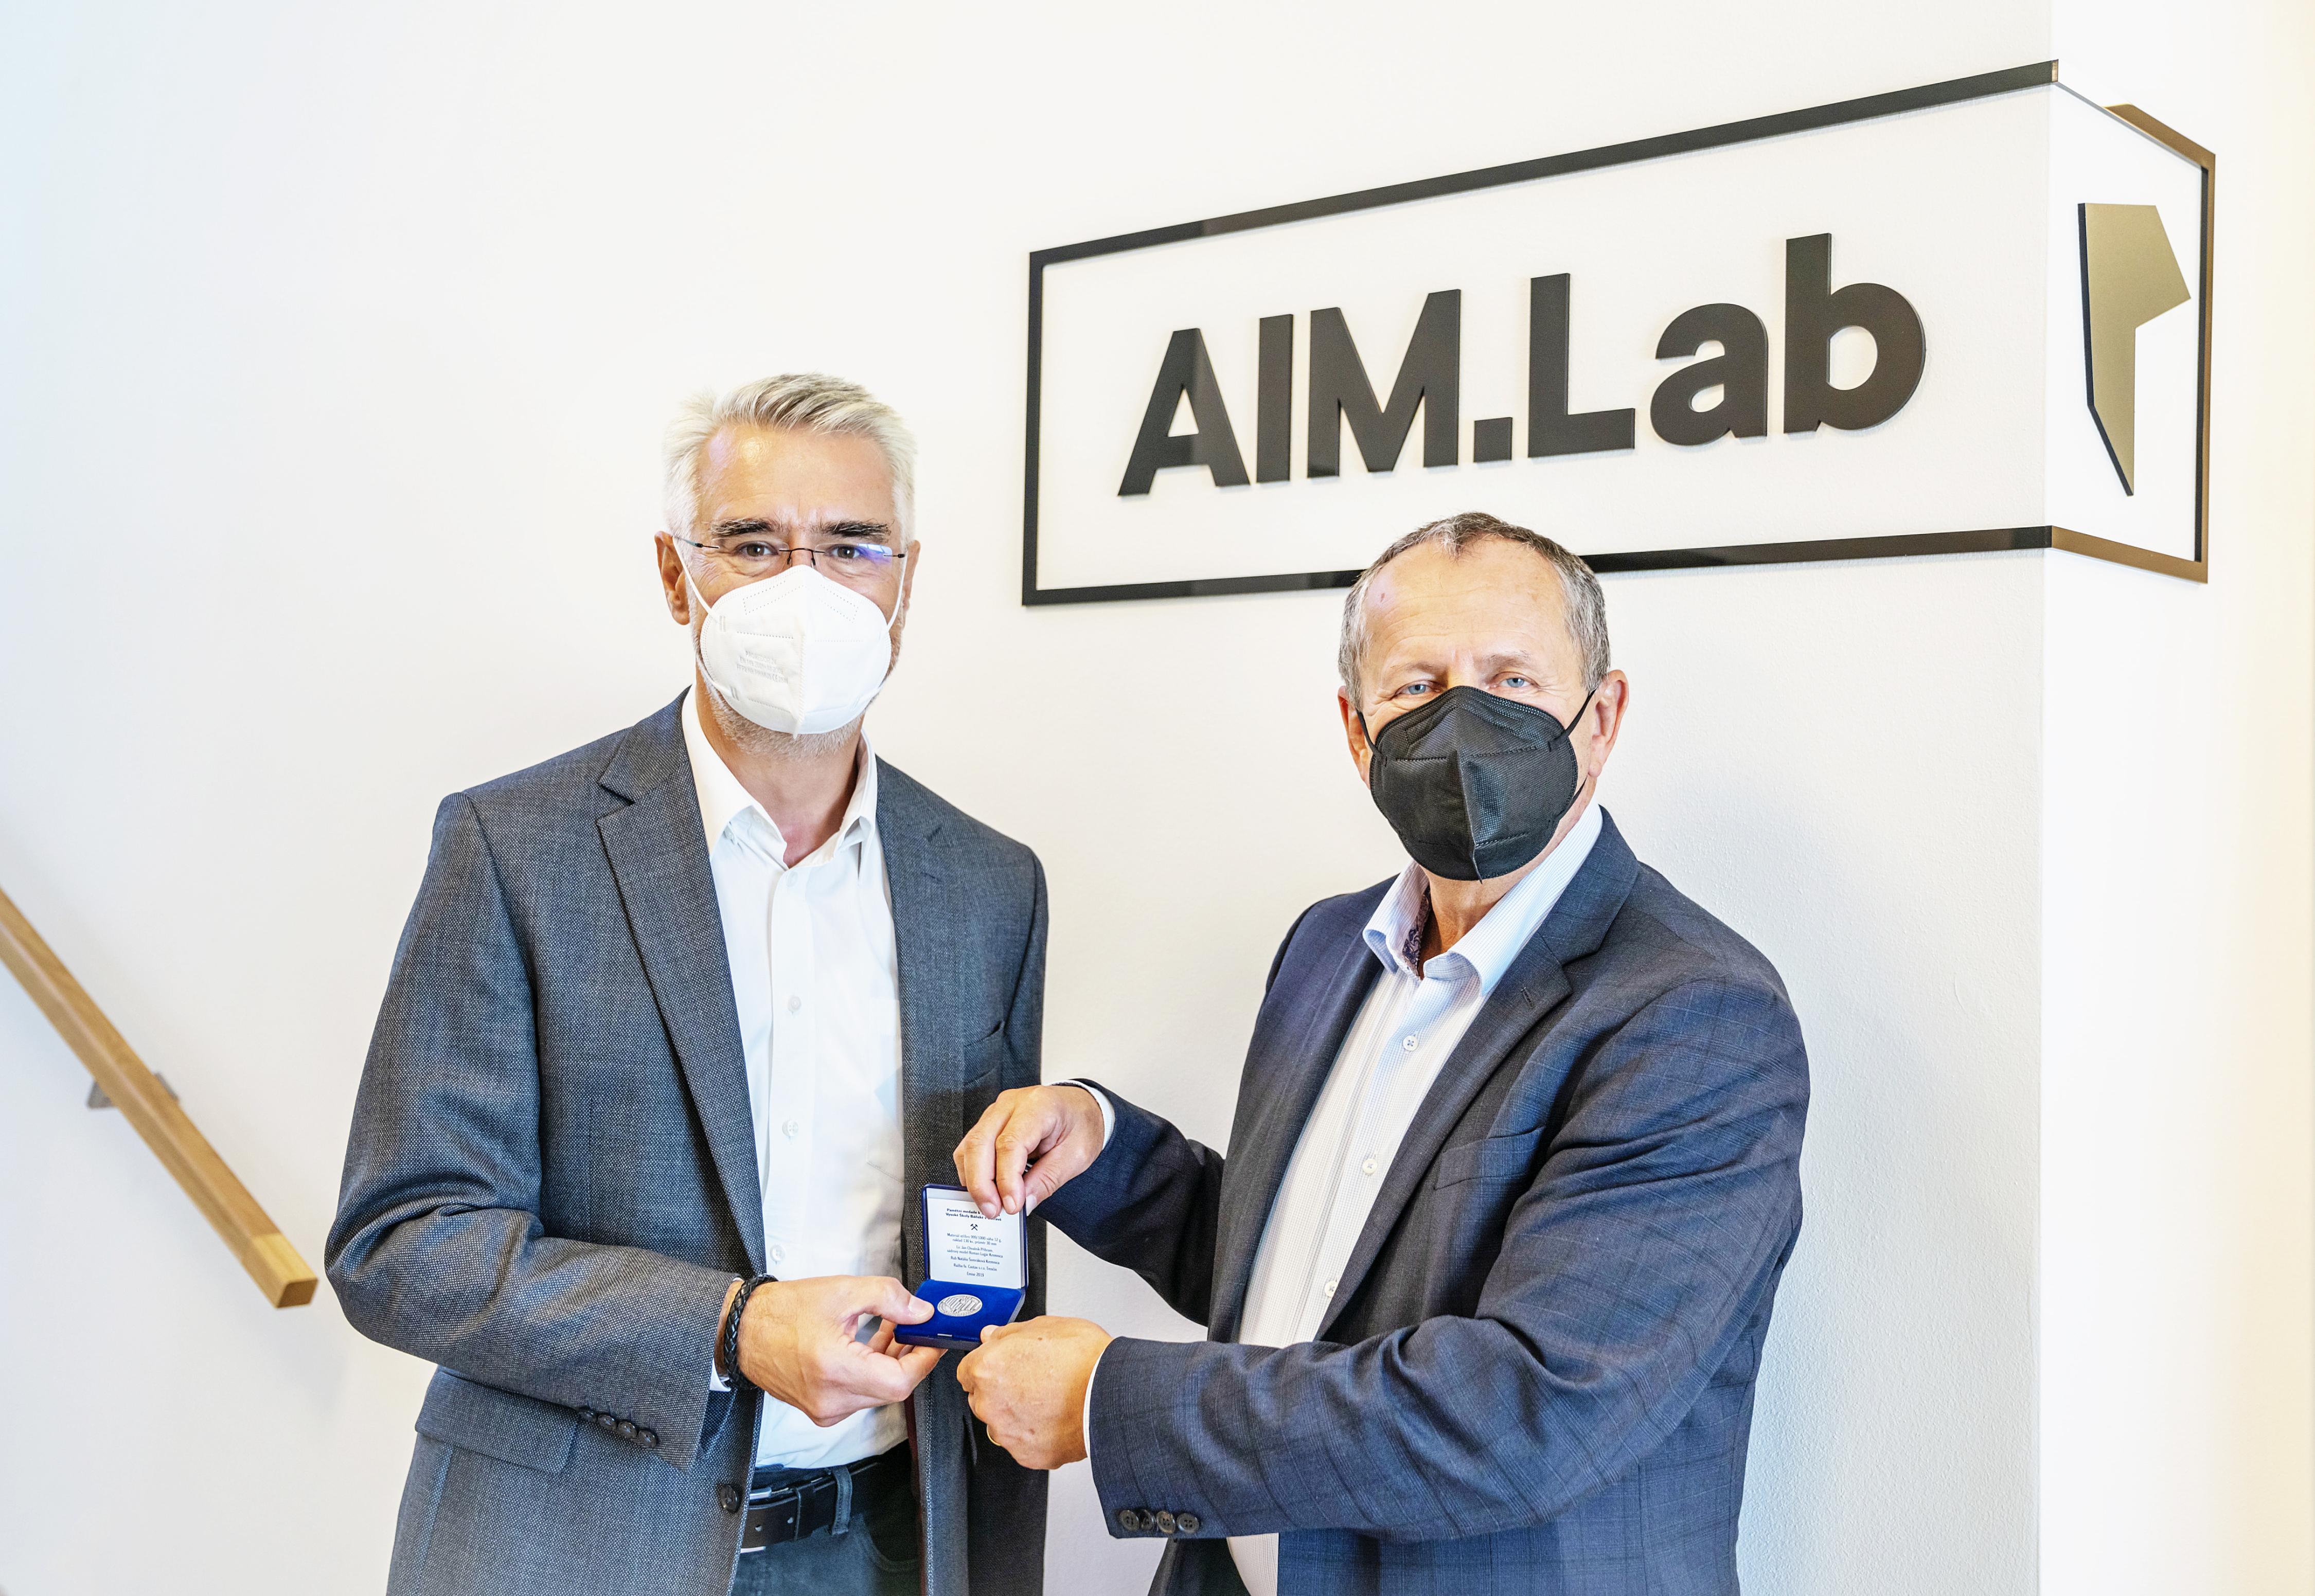 SKODA AUTO opens AIM.Lab in collaboration with the Technical University of Ostrava VSB-TUO - Image 1